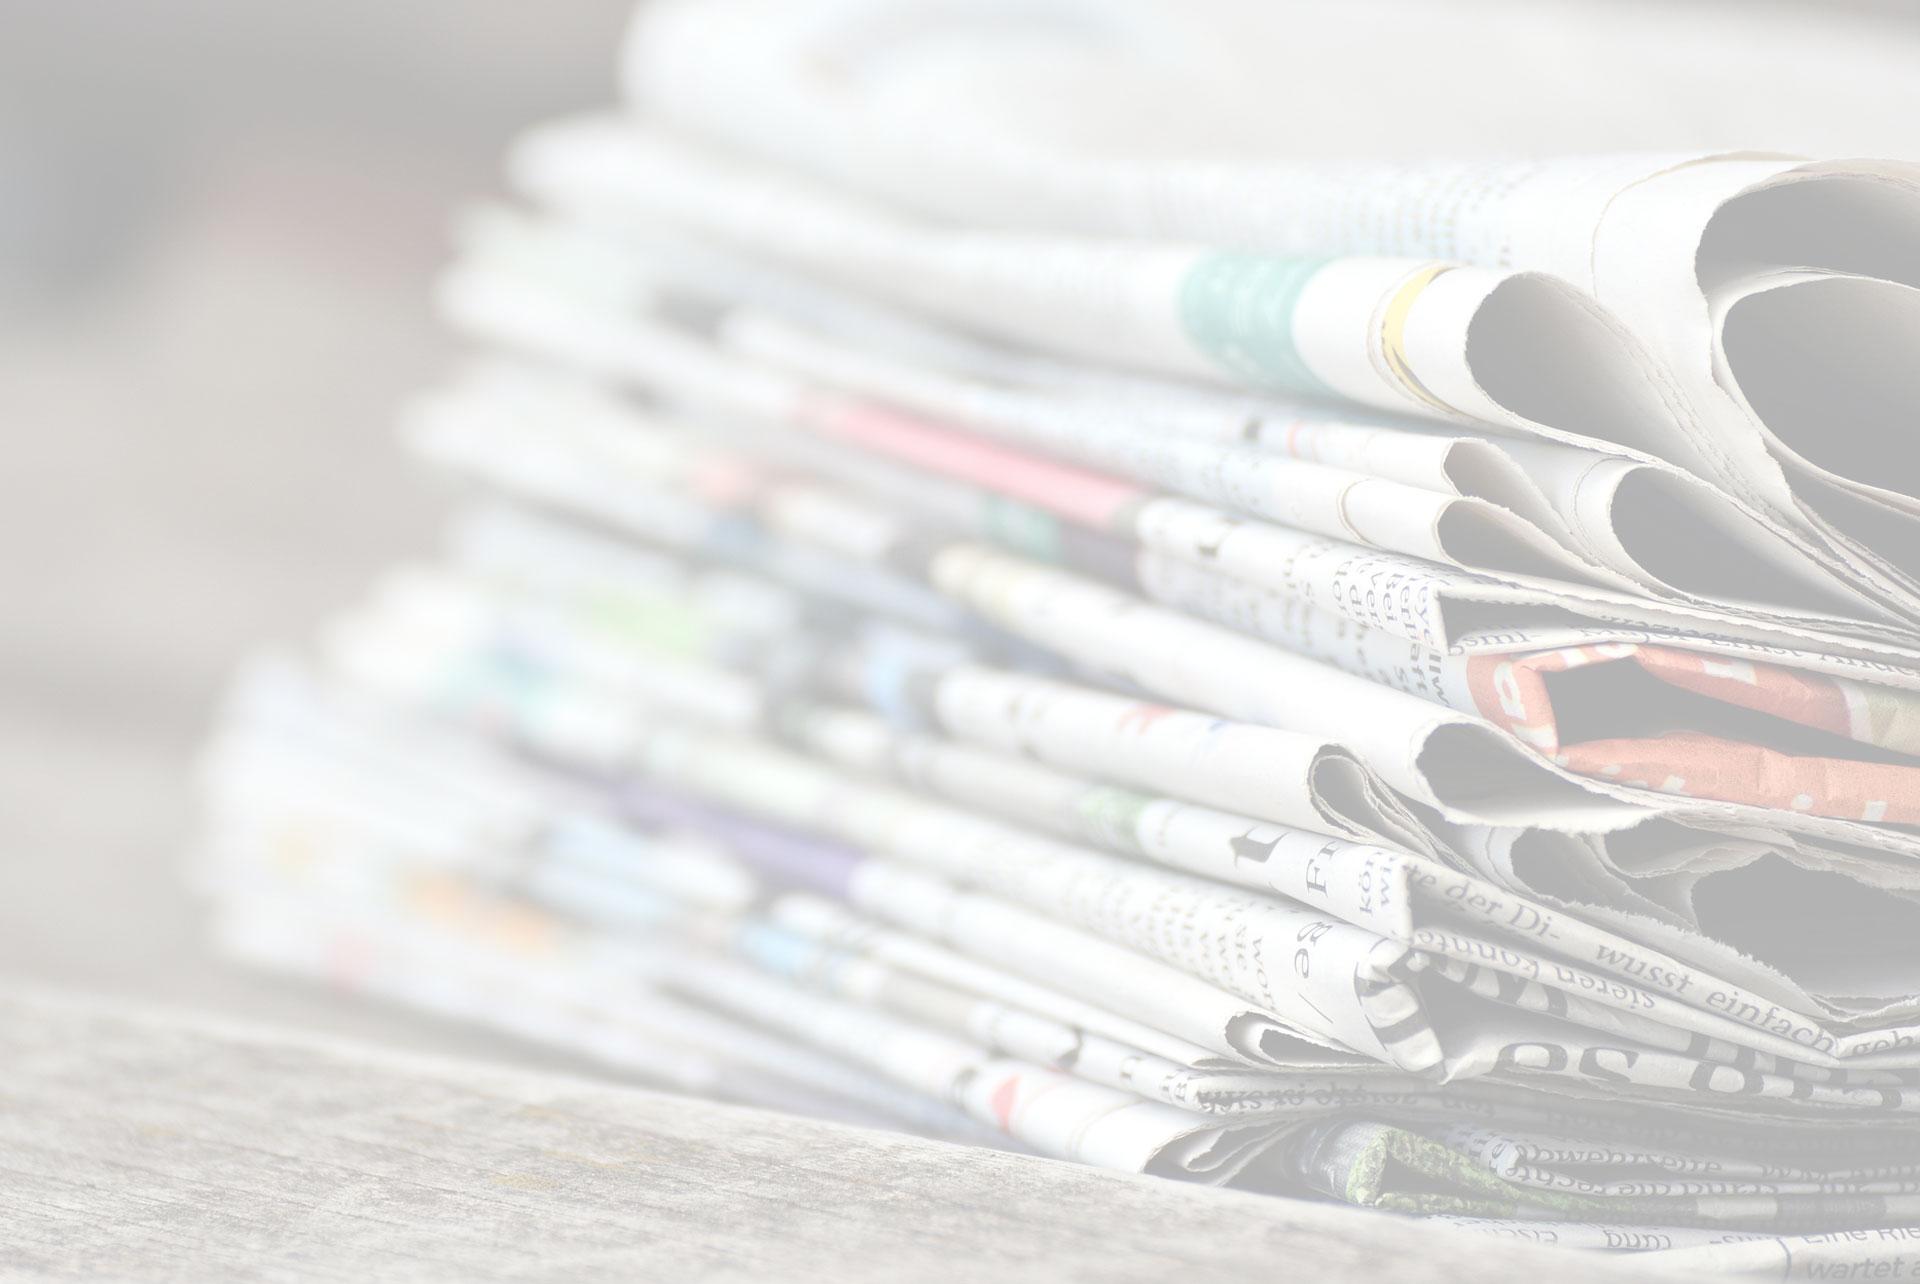 Royalties gonfiate per pagare meno tasse: l'Ue indaga su Nike in Olanda